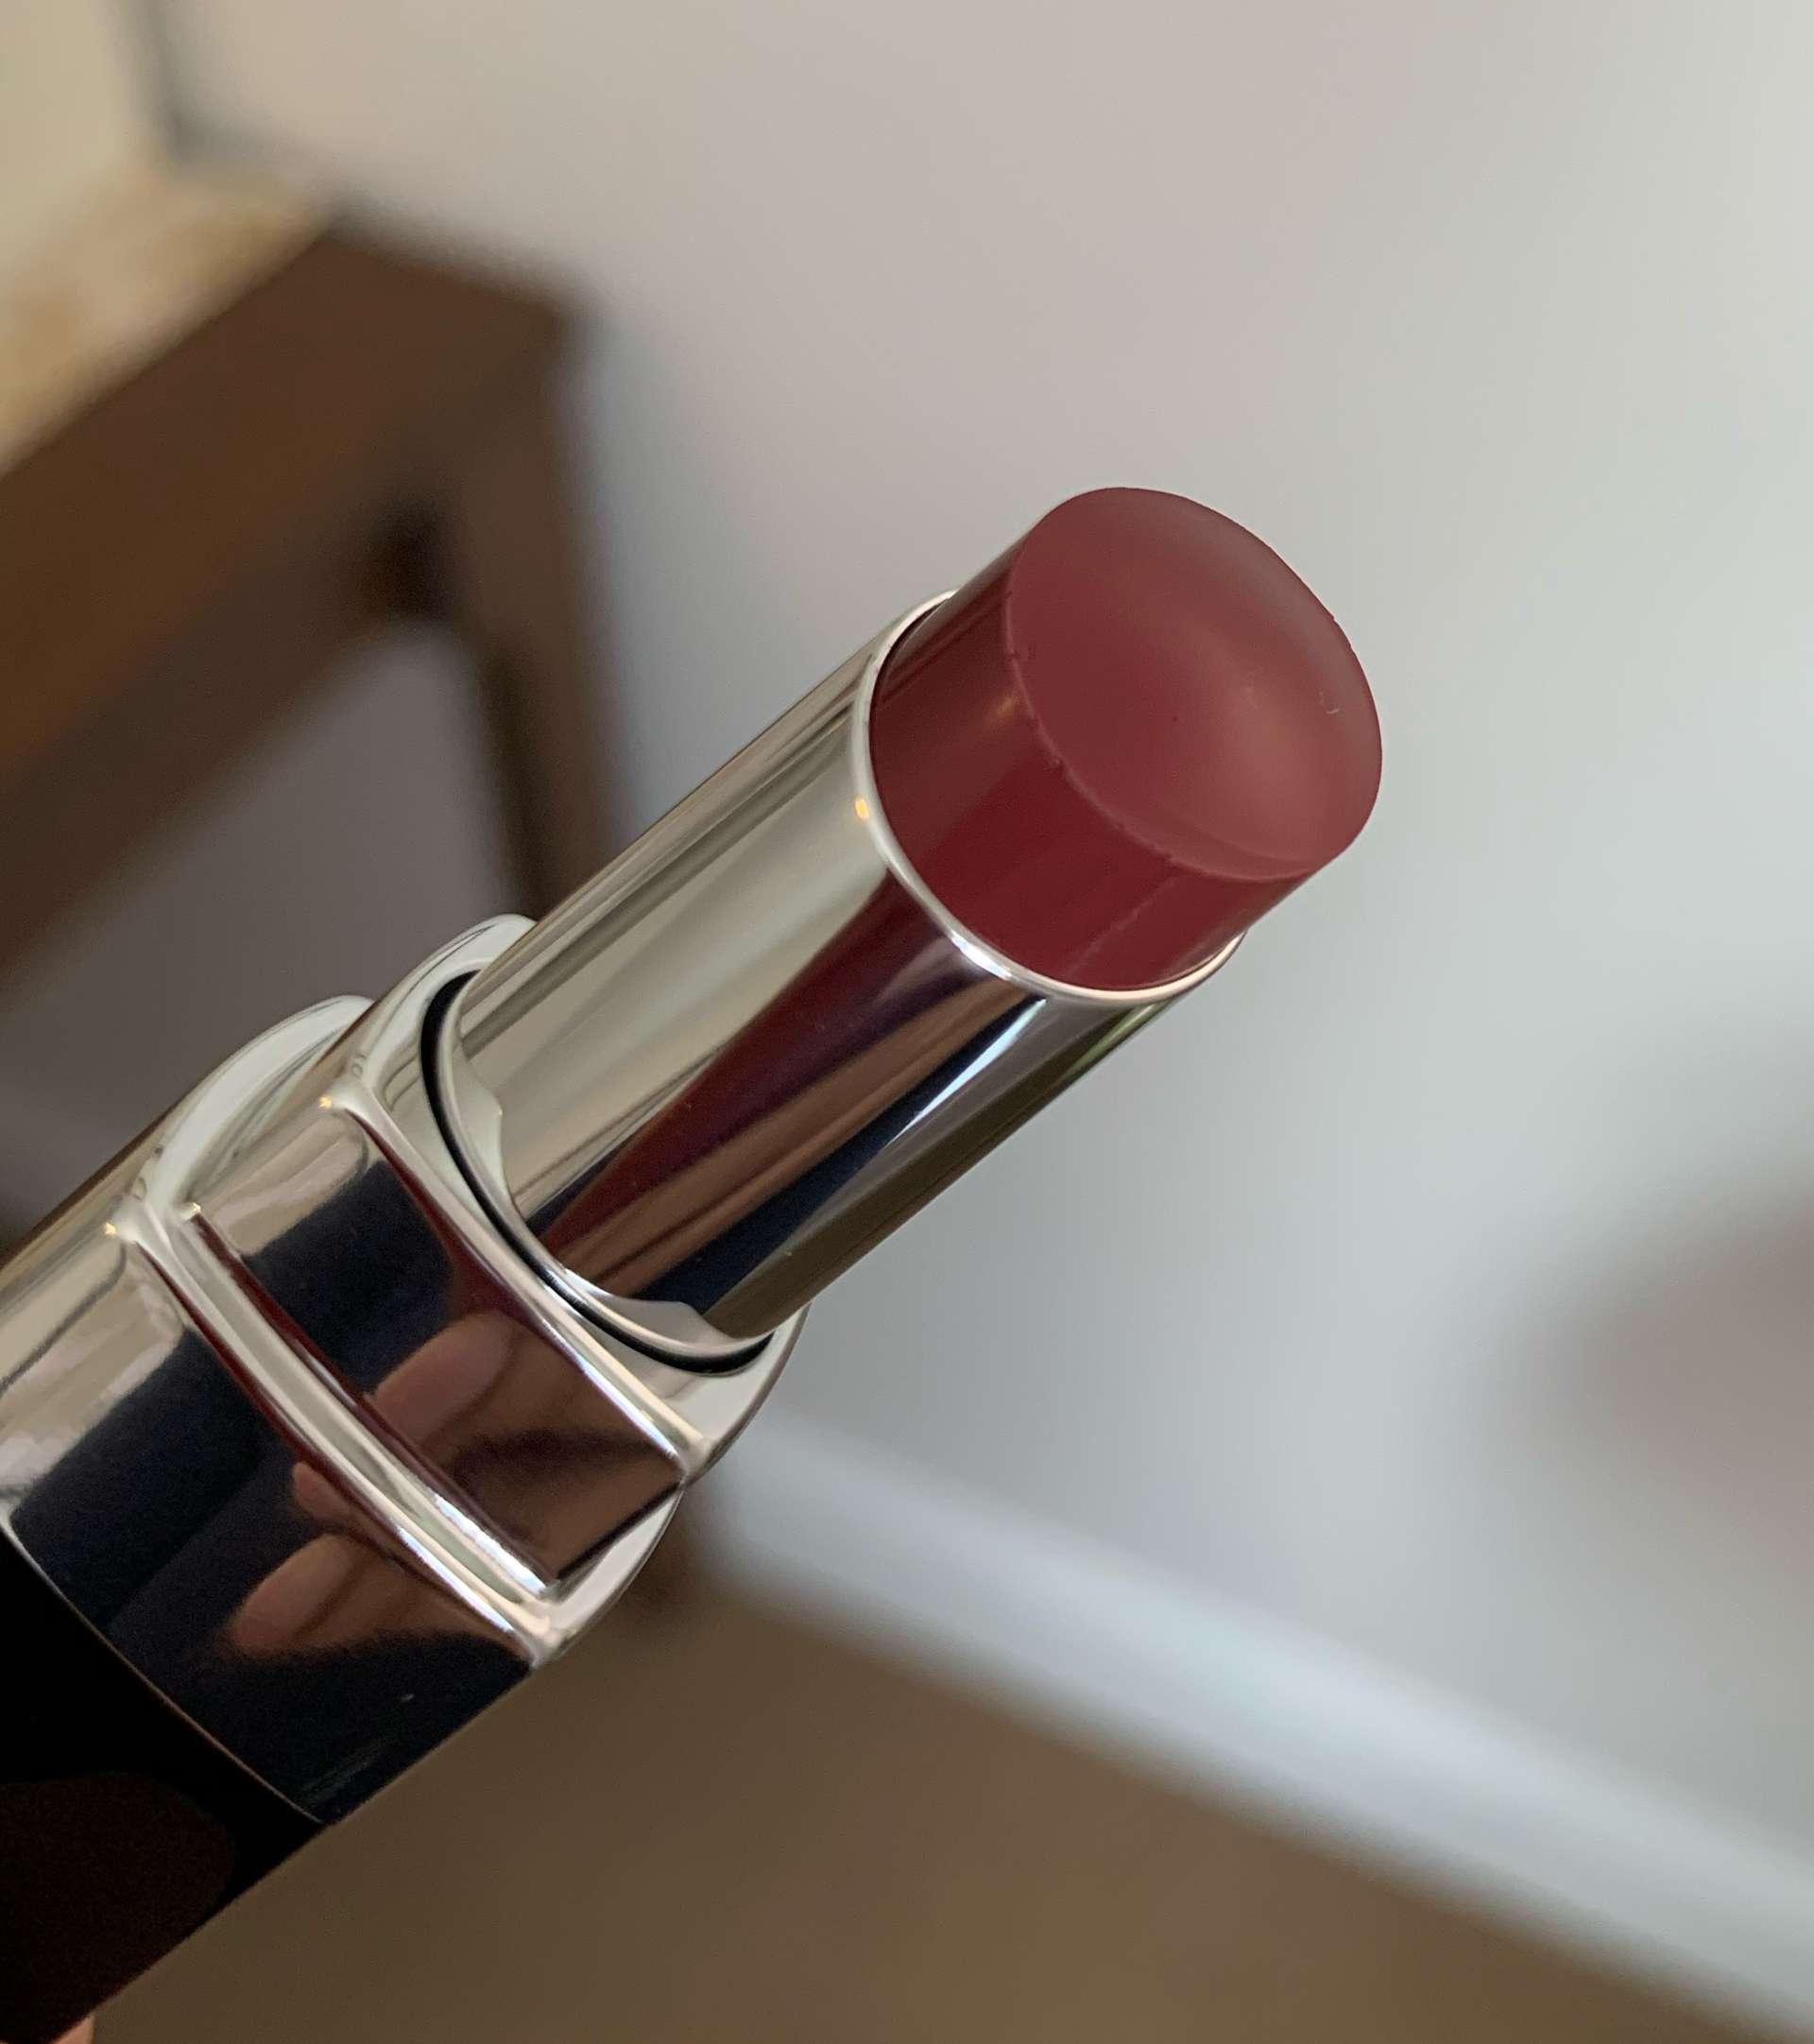 Chanel Rouge Coco Bloom 114 Glow swatch dark skin